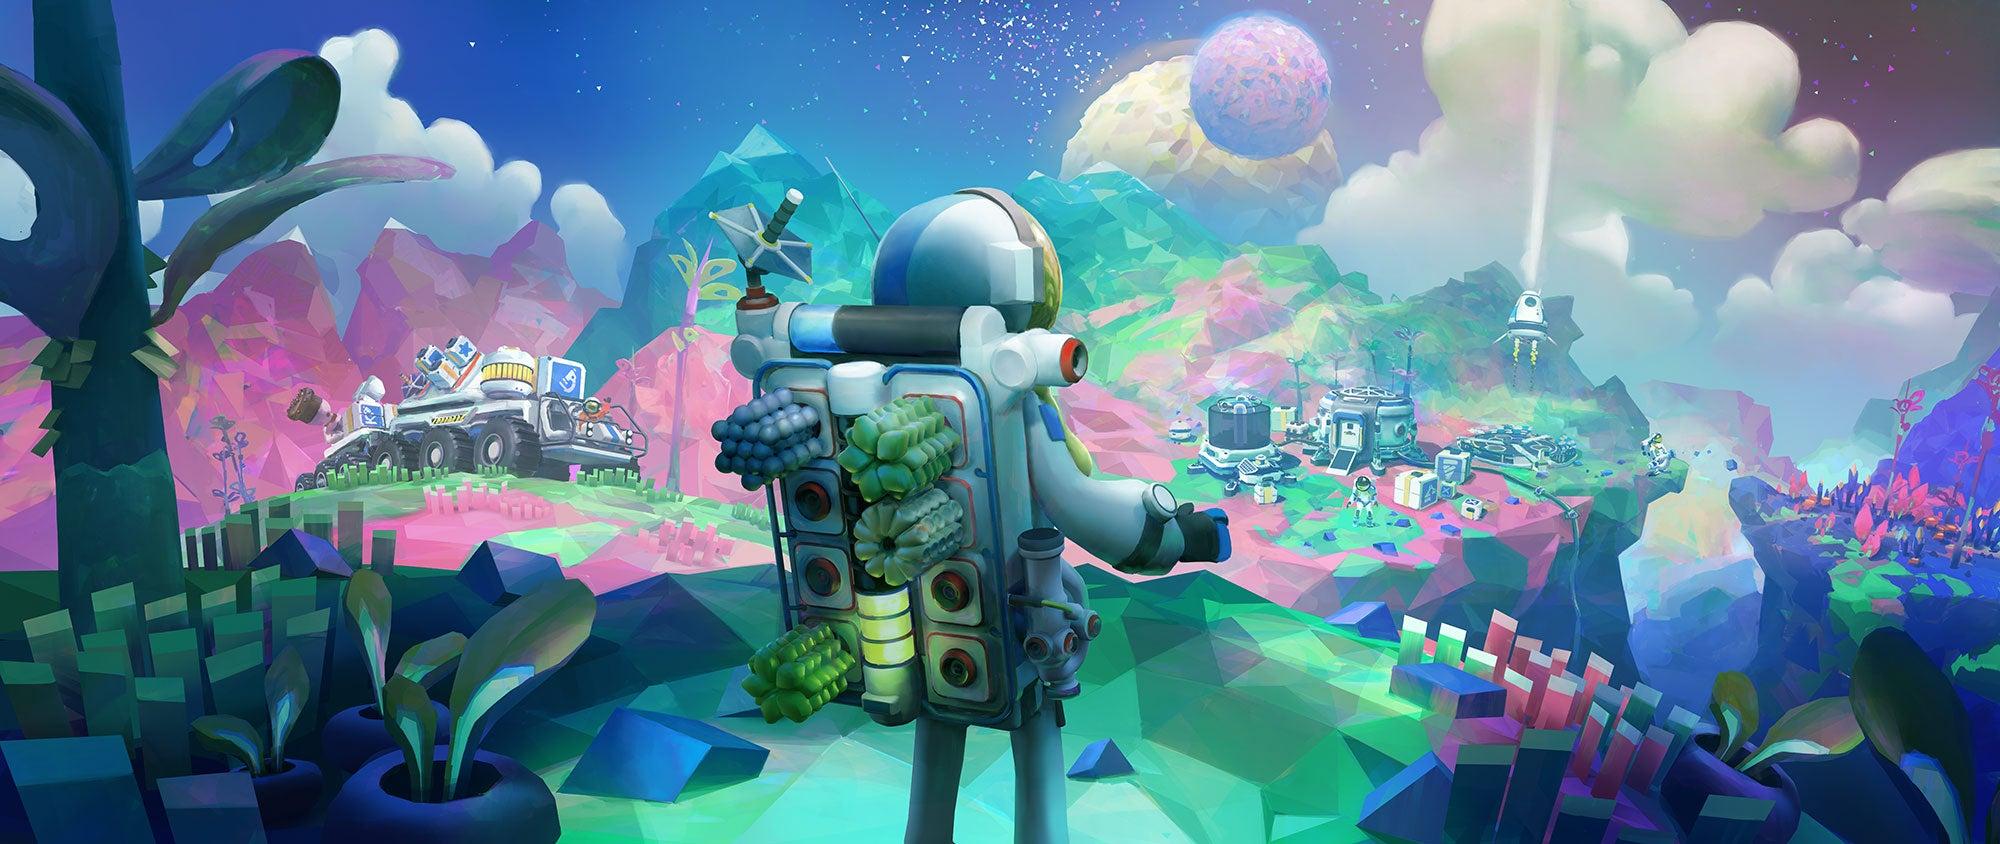 The Best Video Game Art Of 2019 Kotaku Uk